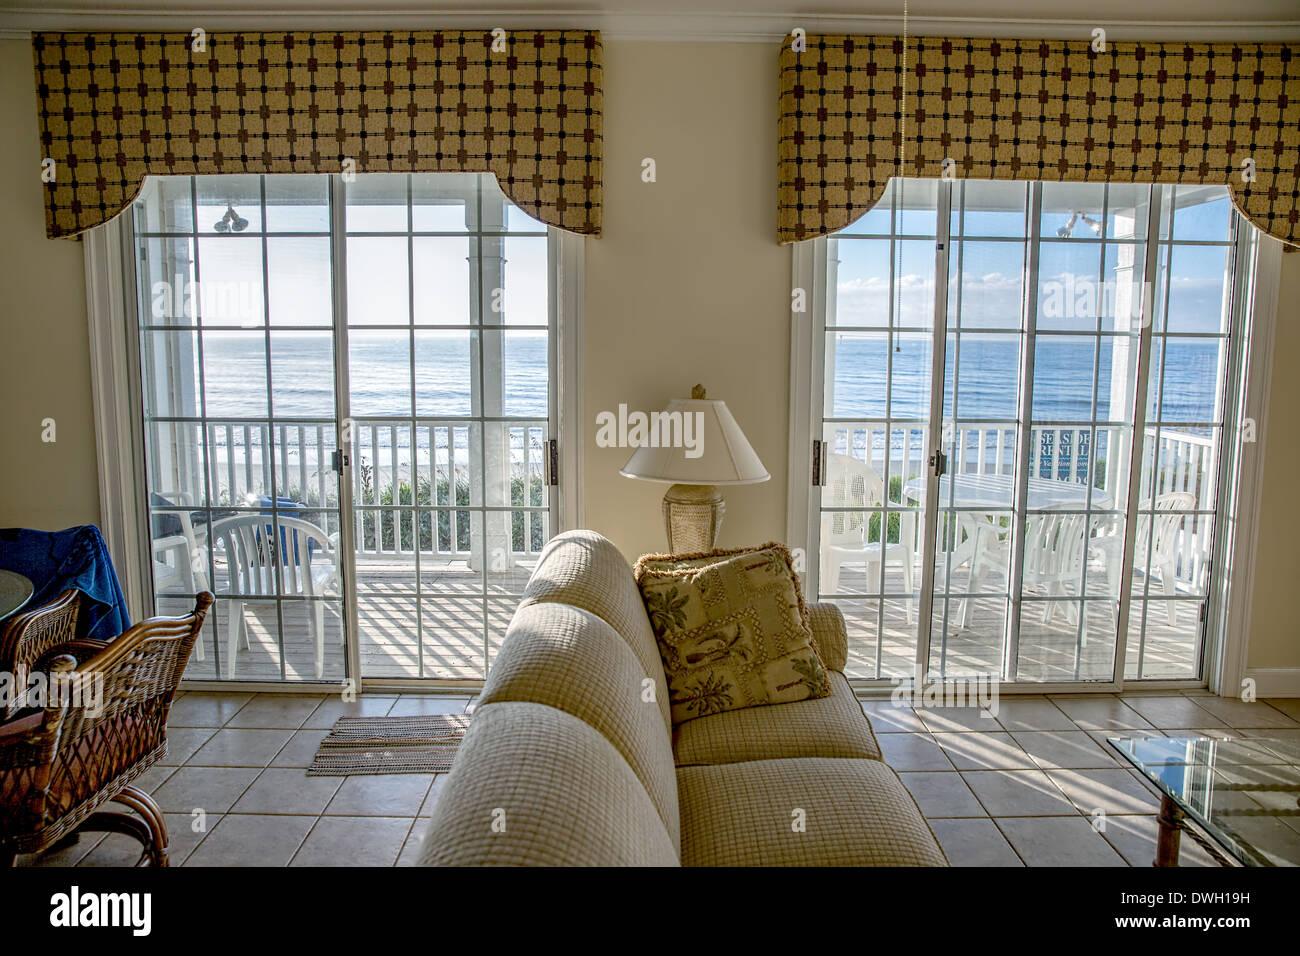 ocean view from south carolina vacation rental stock photo 67371741